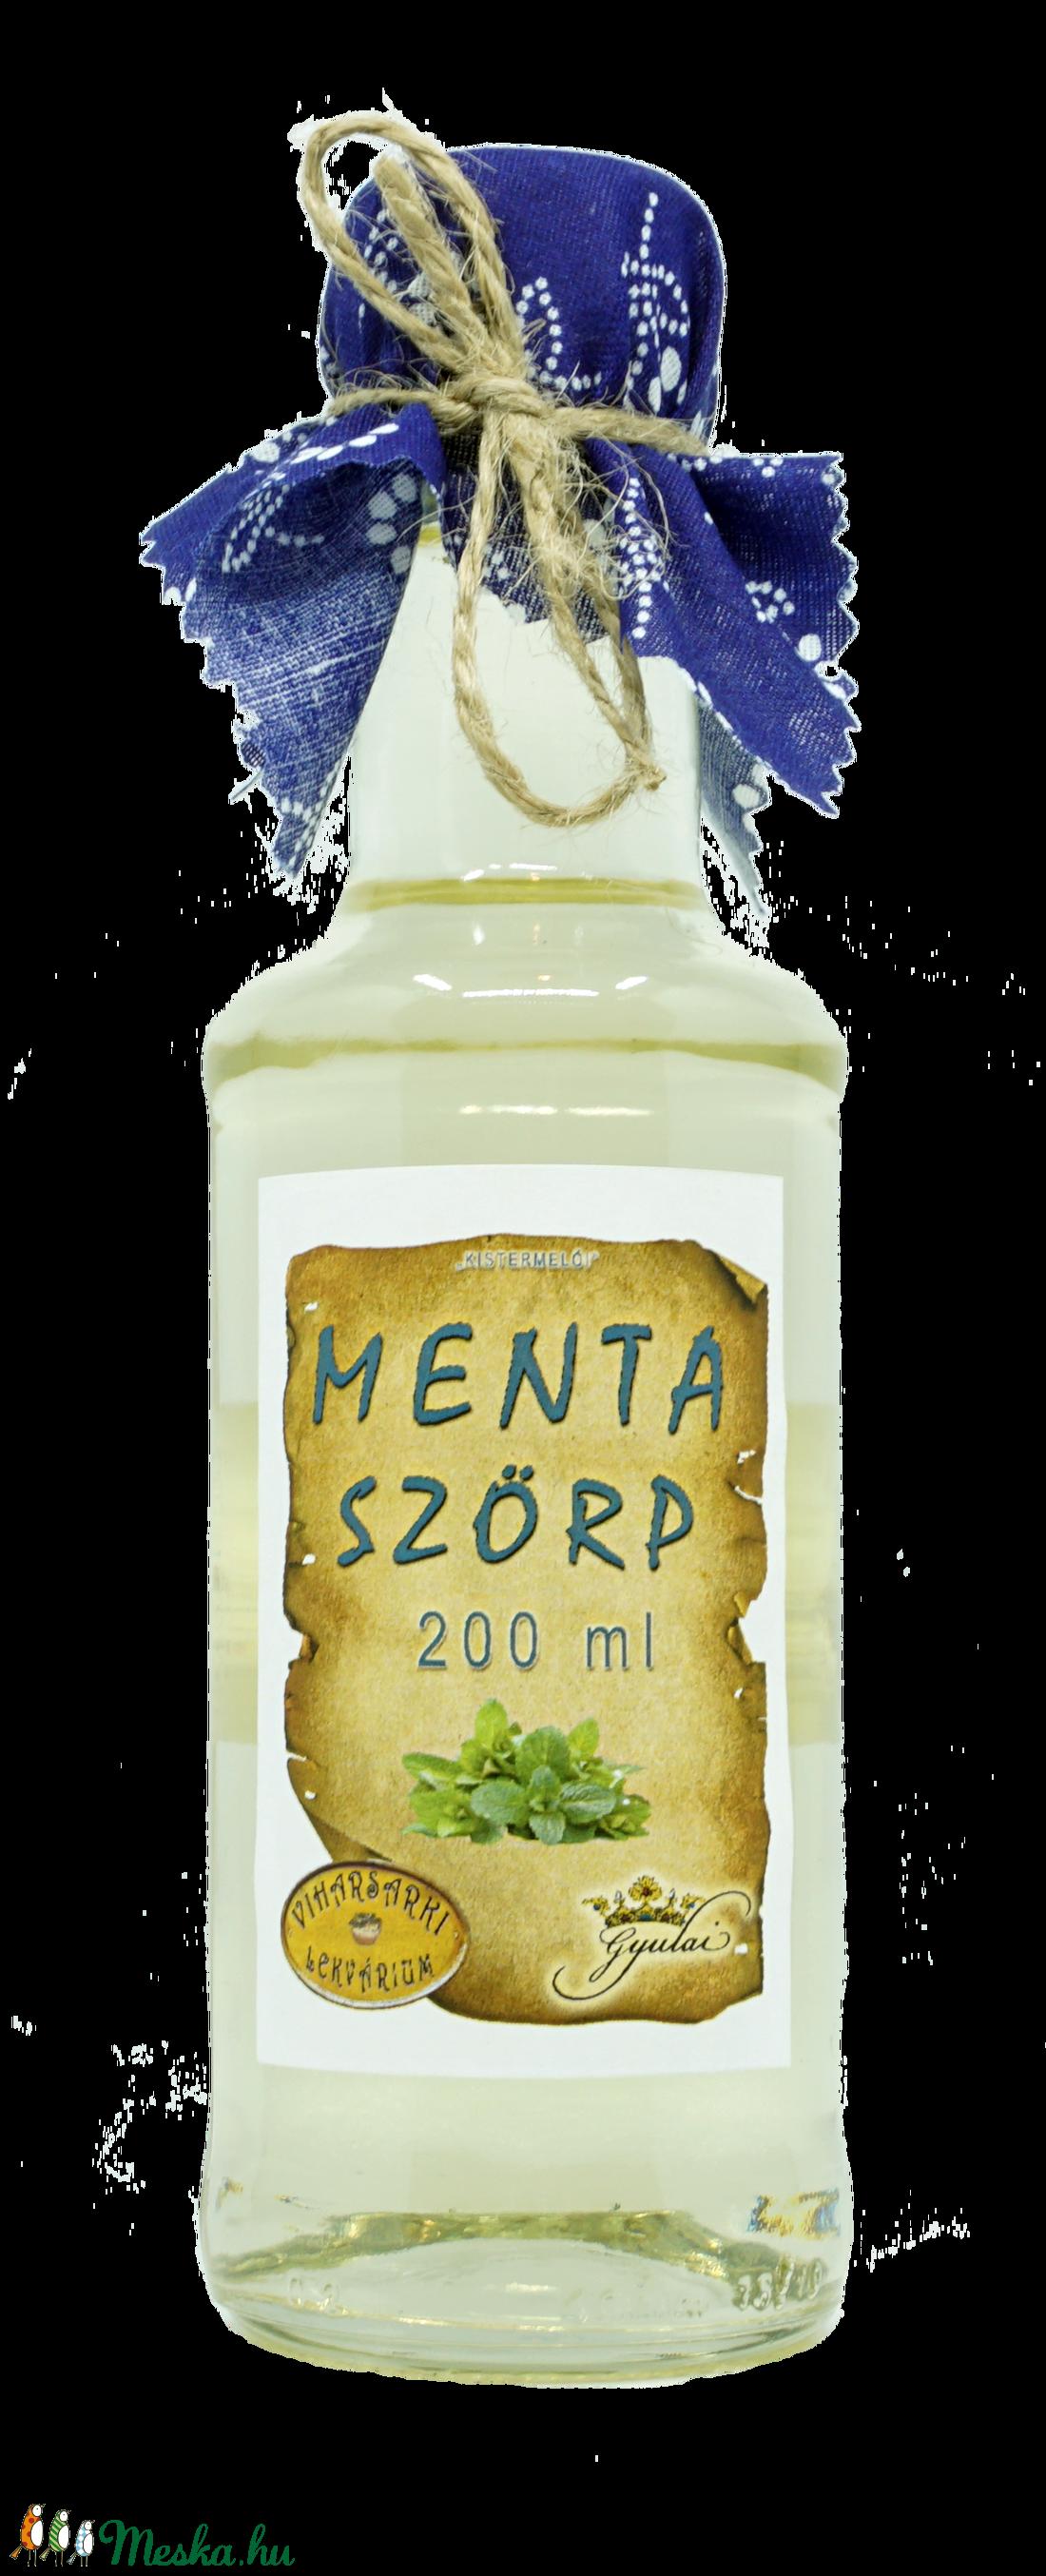 Menta szörp (200 ml) (viharsarkilekvariu) - Meska.hu